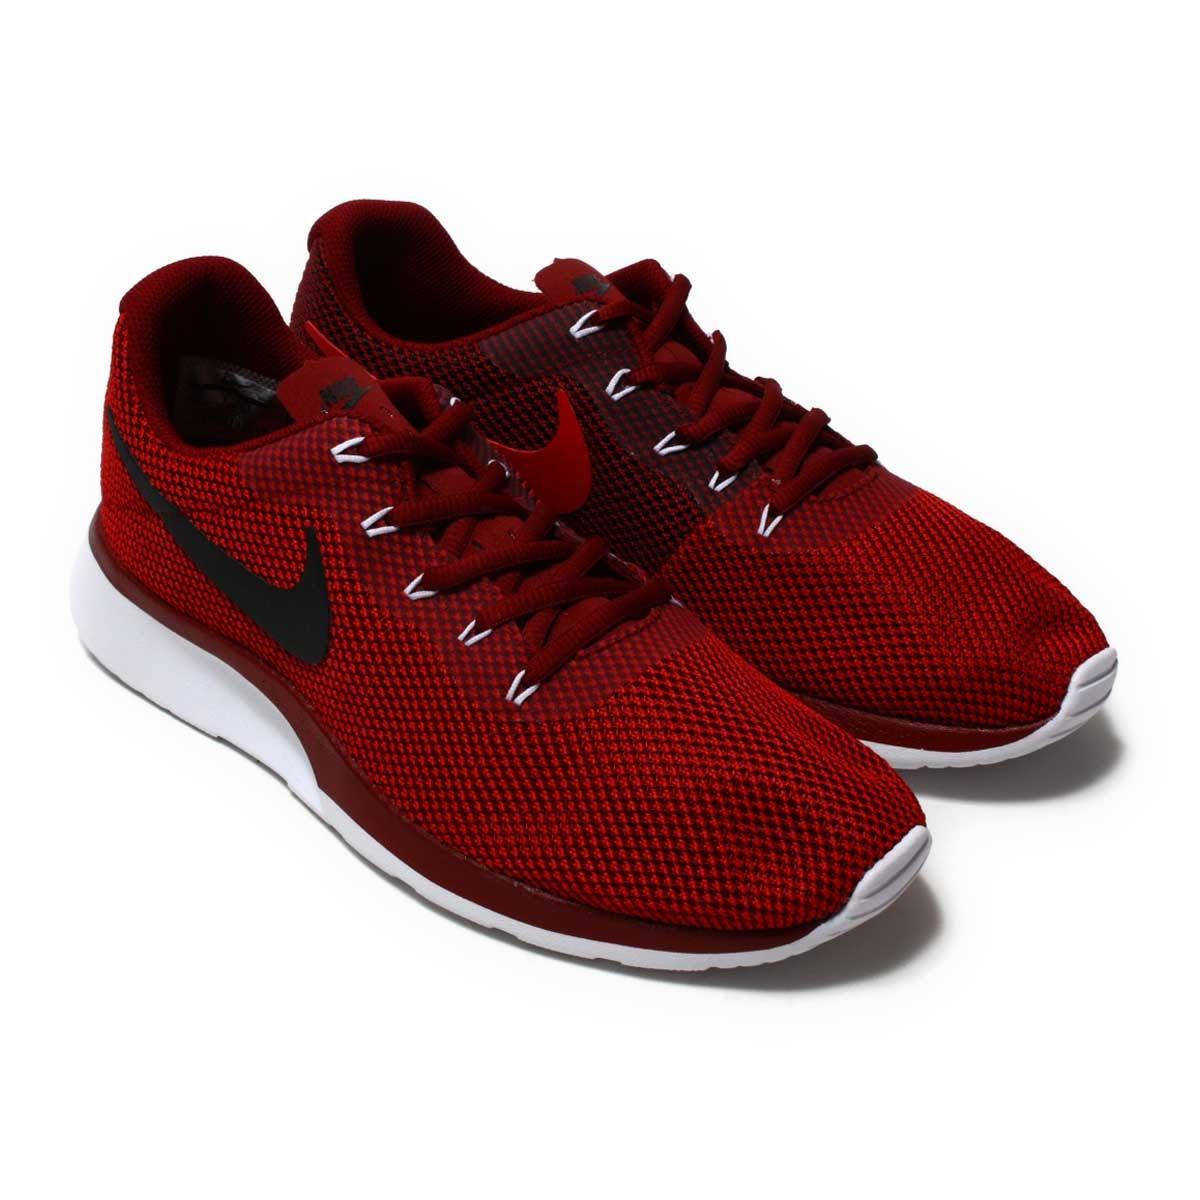 dde3340ebf79 NIKE TANJUN RACER (Nike tongue Jun racer) TEAM RED BLACK-GYM RED-WHITE  17HO-I